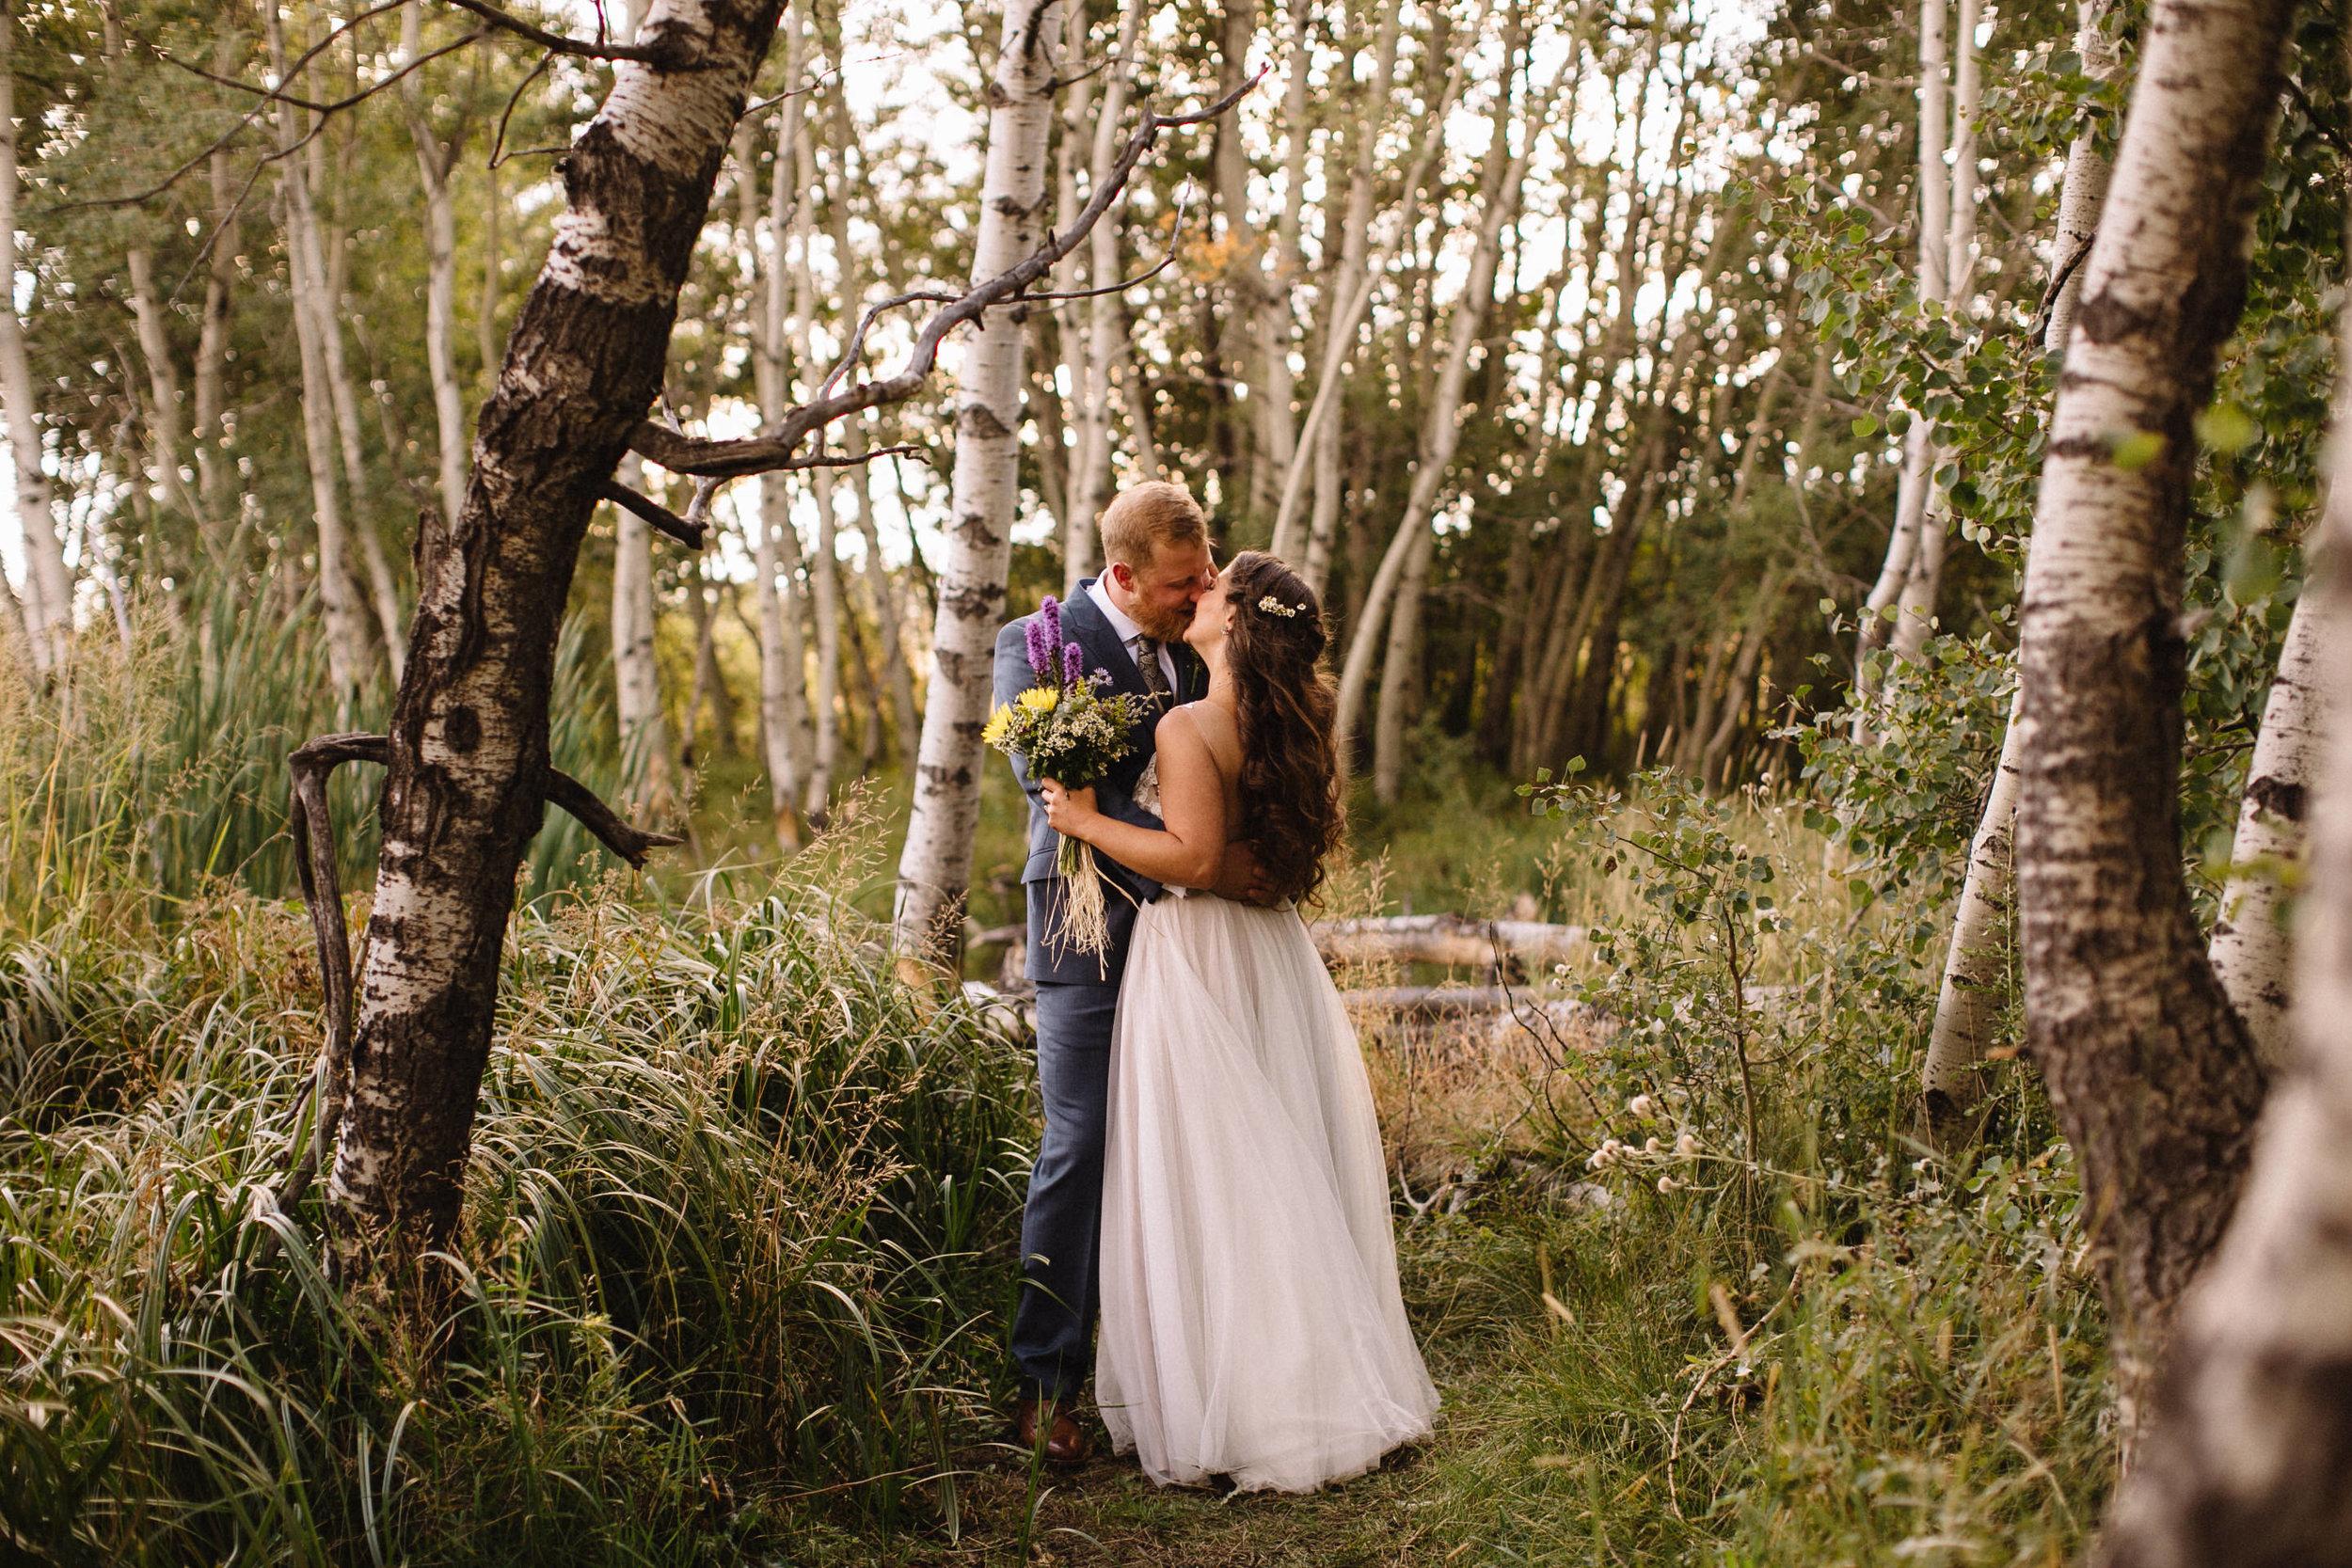 Liz Osban Photography Vedauwoo Buford Wyoming Happy Jack Wedding Elopement Destination Small Forest Cheyenne Laramie Medicine Bow National Forest Portraits Sarah Taylor3.jpg